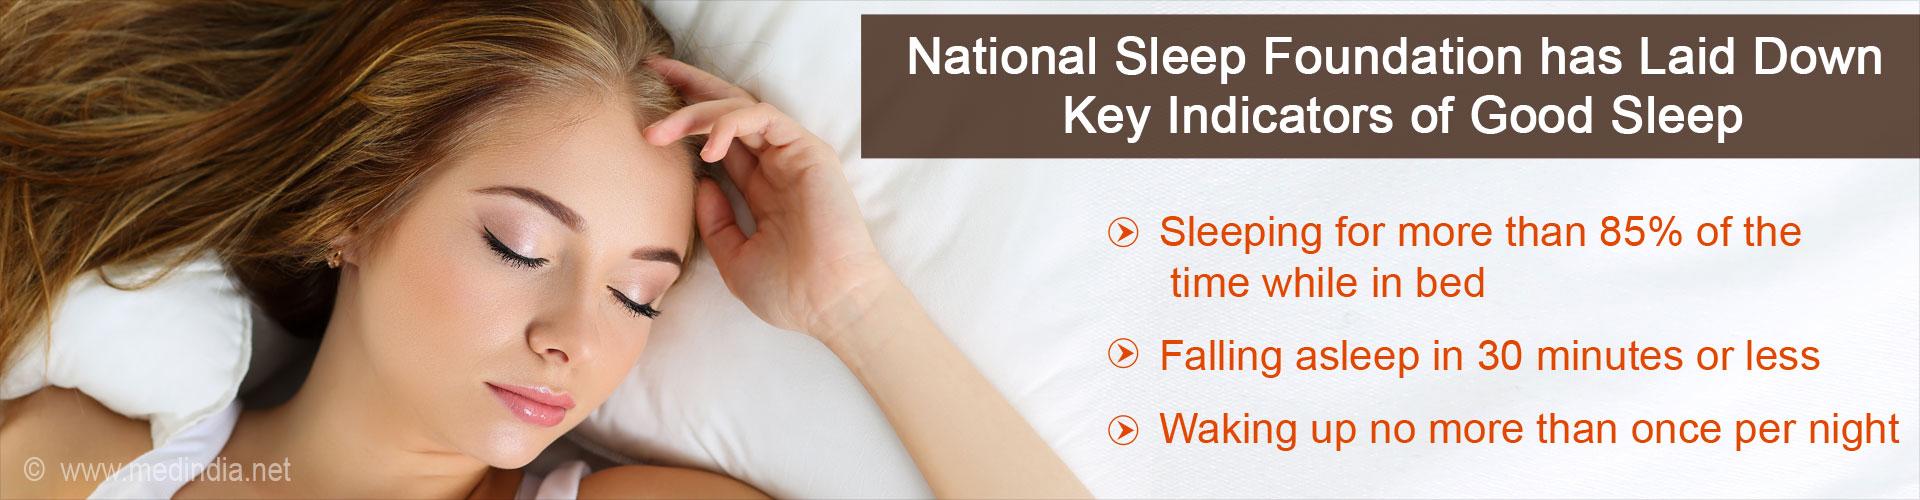 Key Indicators of Good Sleep Released by National Sleep Foundation